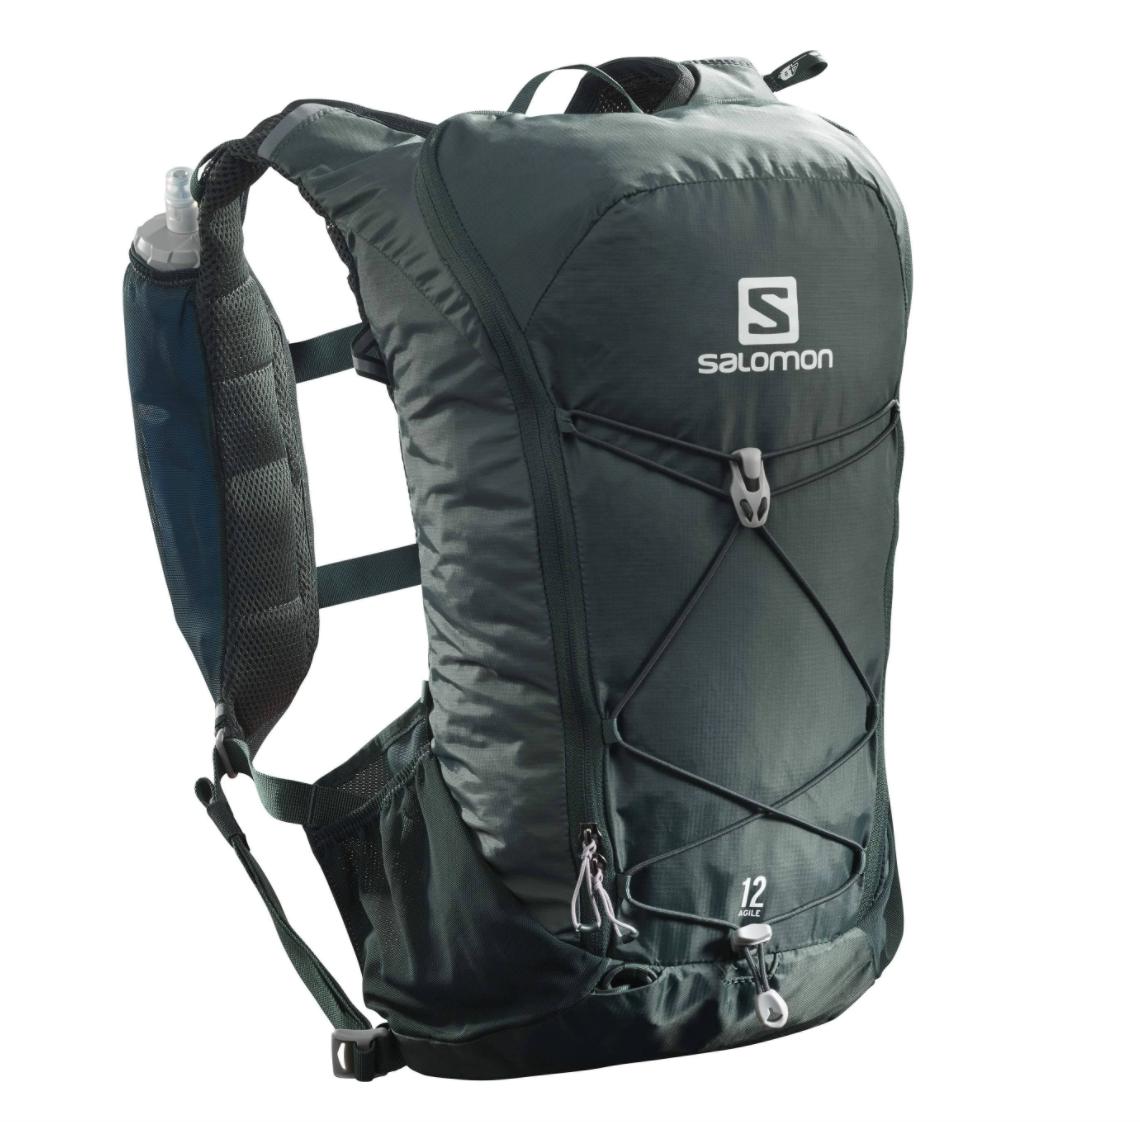 【20%OFF】SALOMON サロモン バックパック AGILE 12 SET Black LC1305100